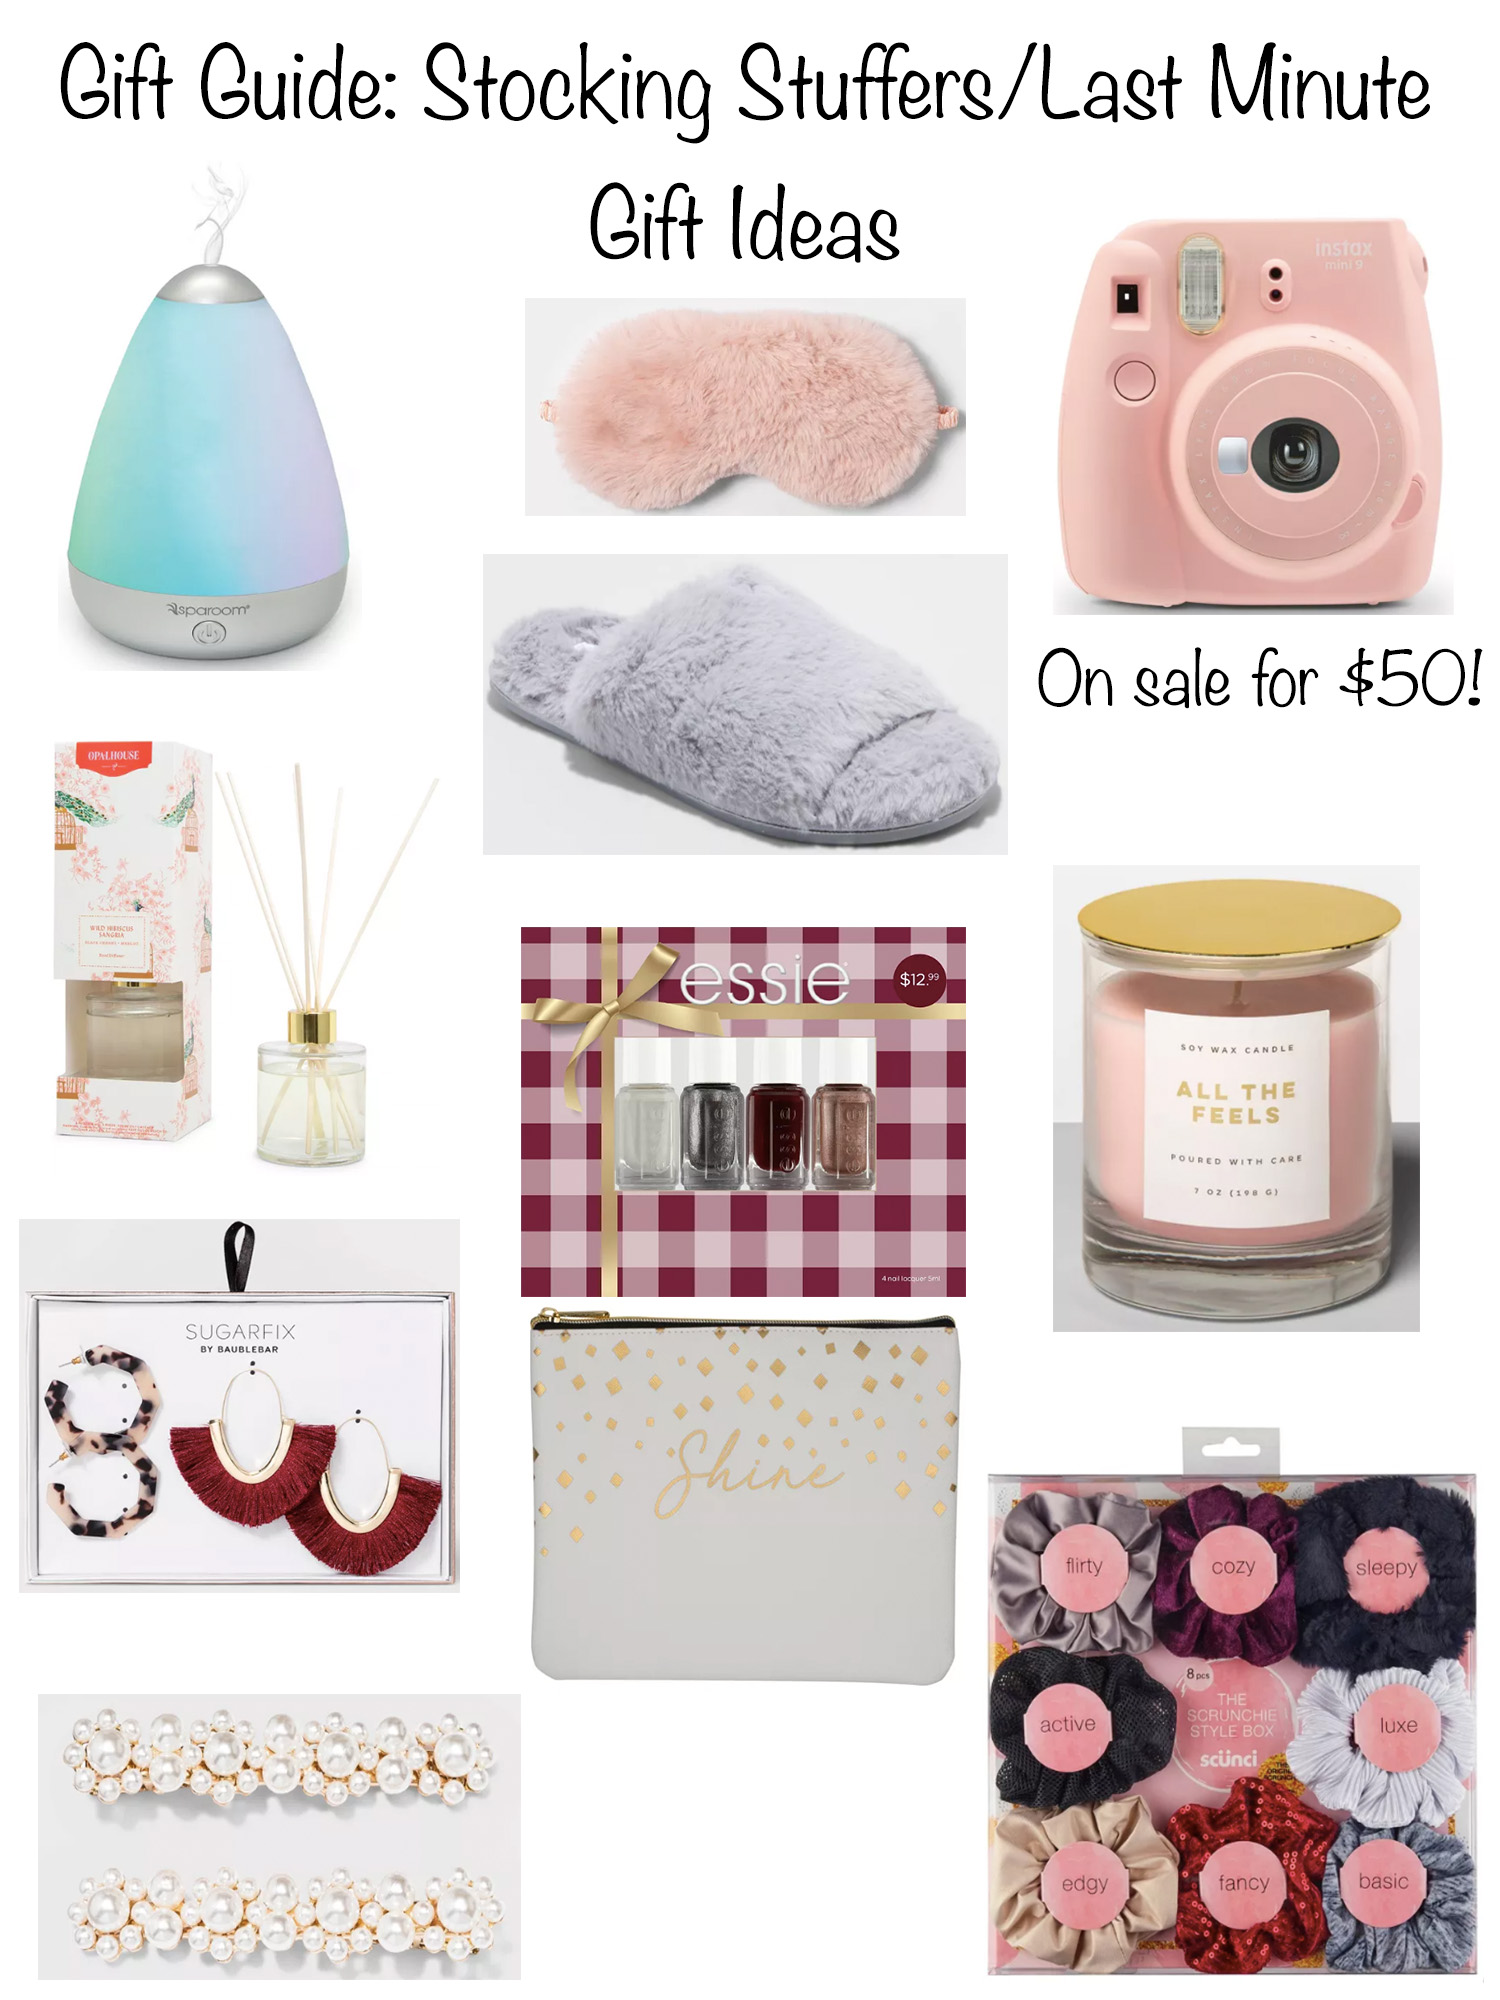 Last Minute Gift Ideas Stocking Stuffers